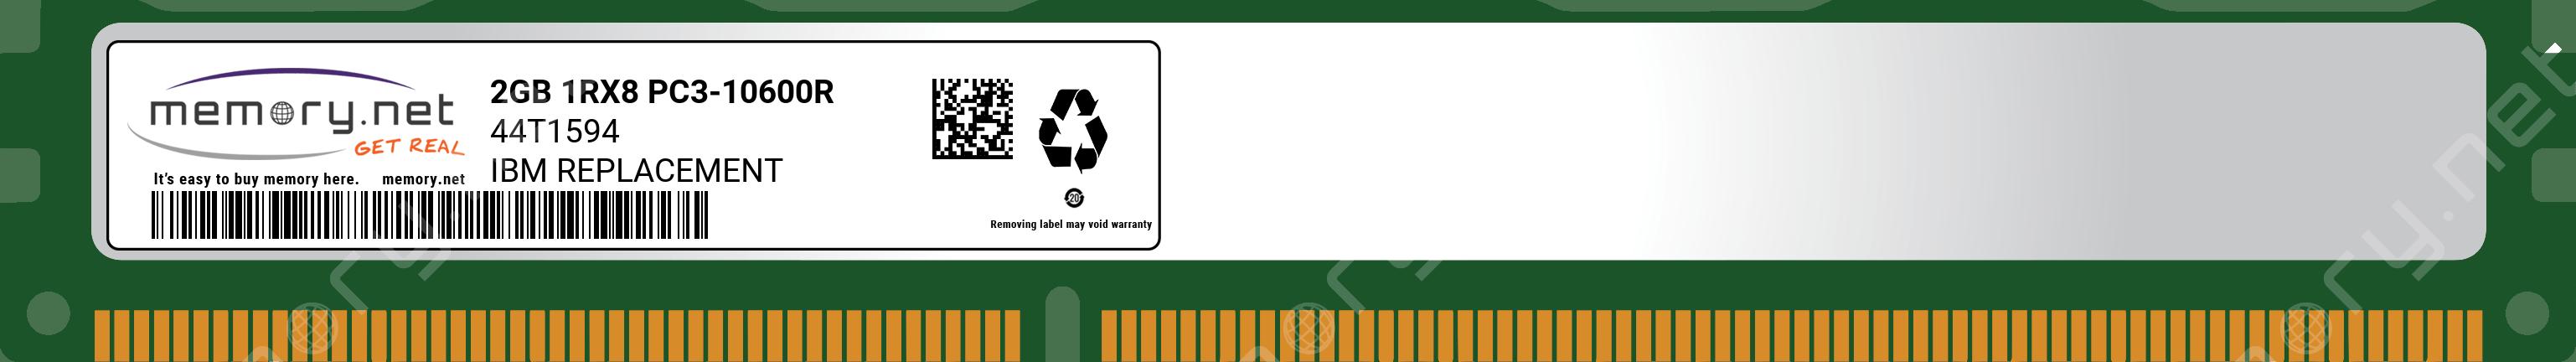 44T1594